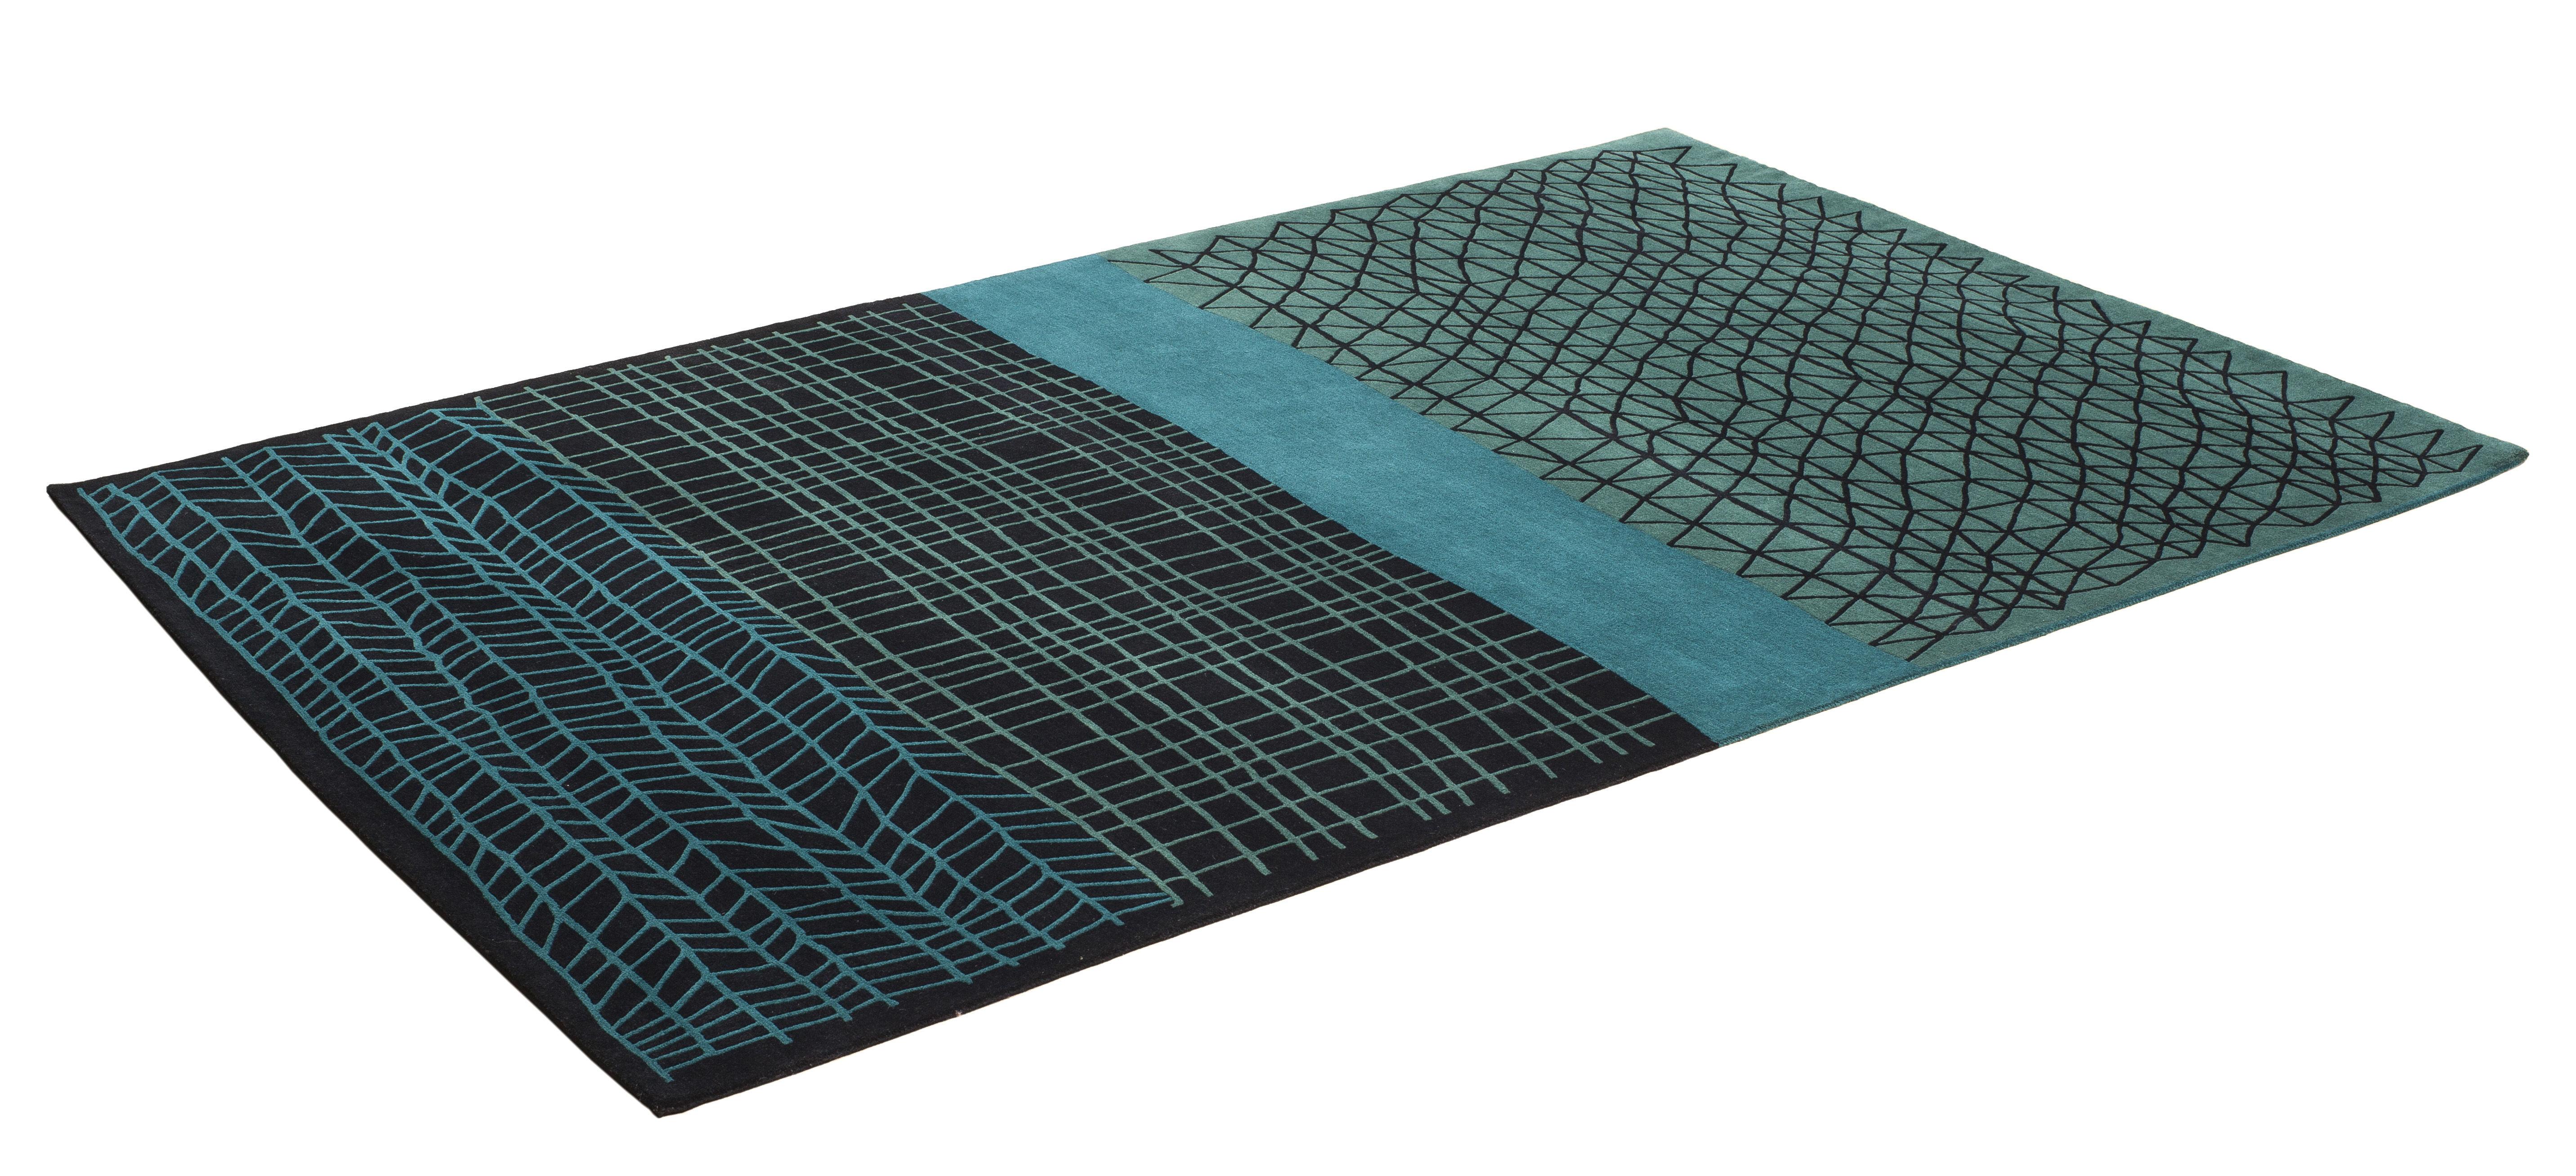 tapis mogador 300 x 200 cm noir vert bleu chevalier dition. Black Bedroom Furniture Sets. Home Design Ideas